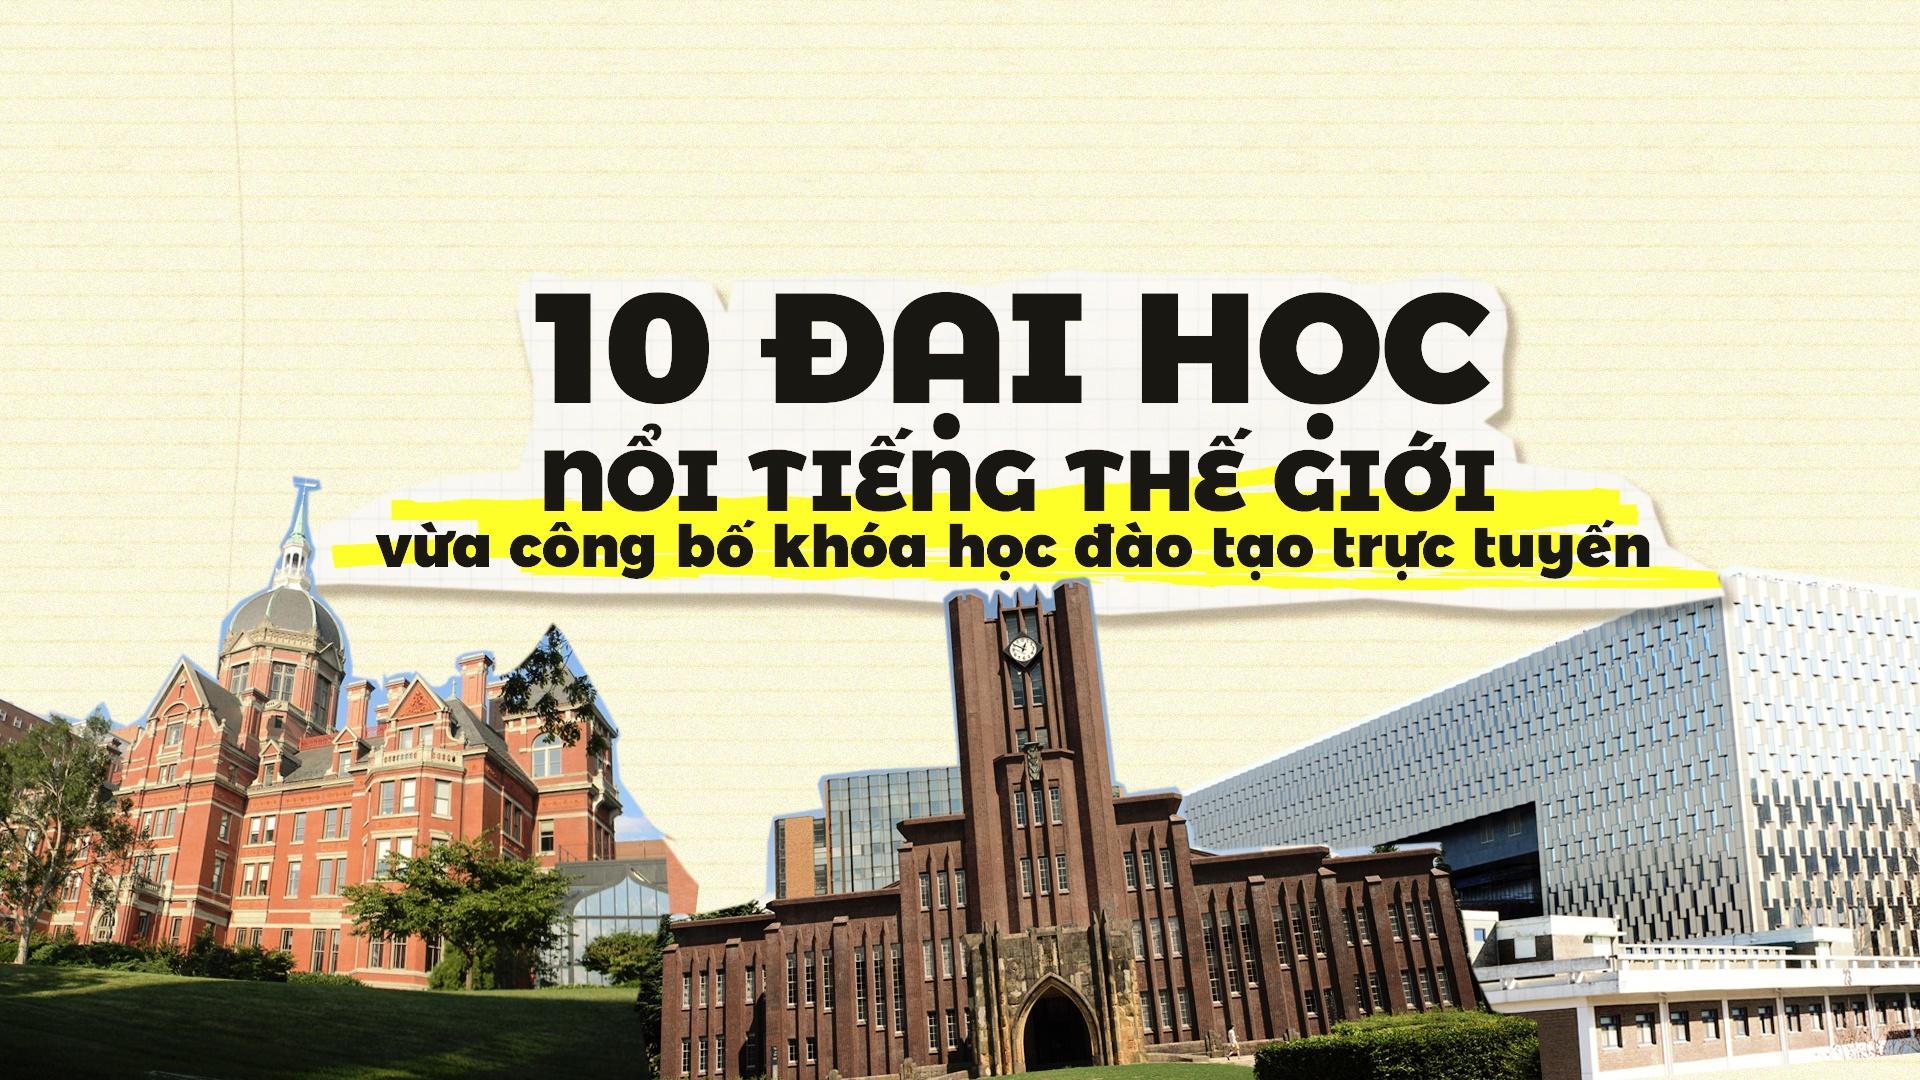 10 dai hoc noi tieng the gioi cong bo khoa hoc dao tao truc tuyen hinh anh 1